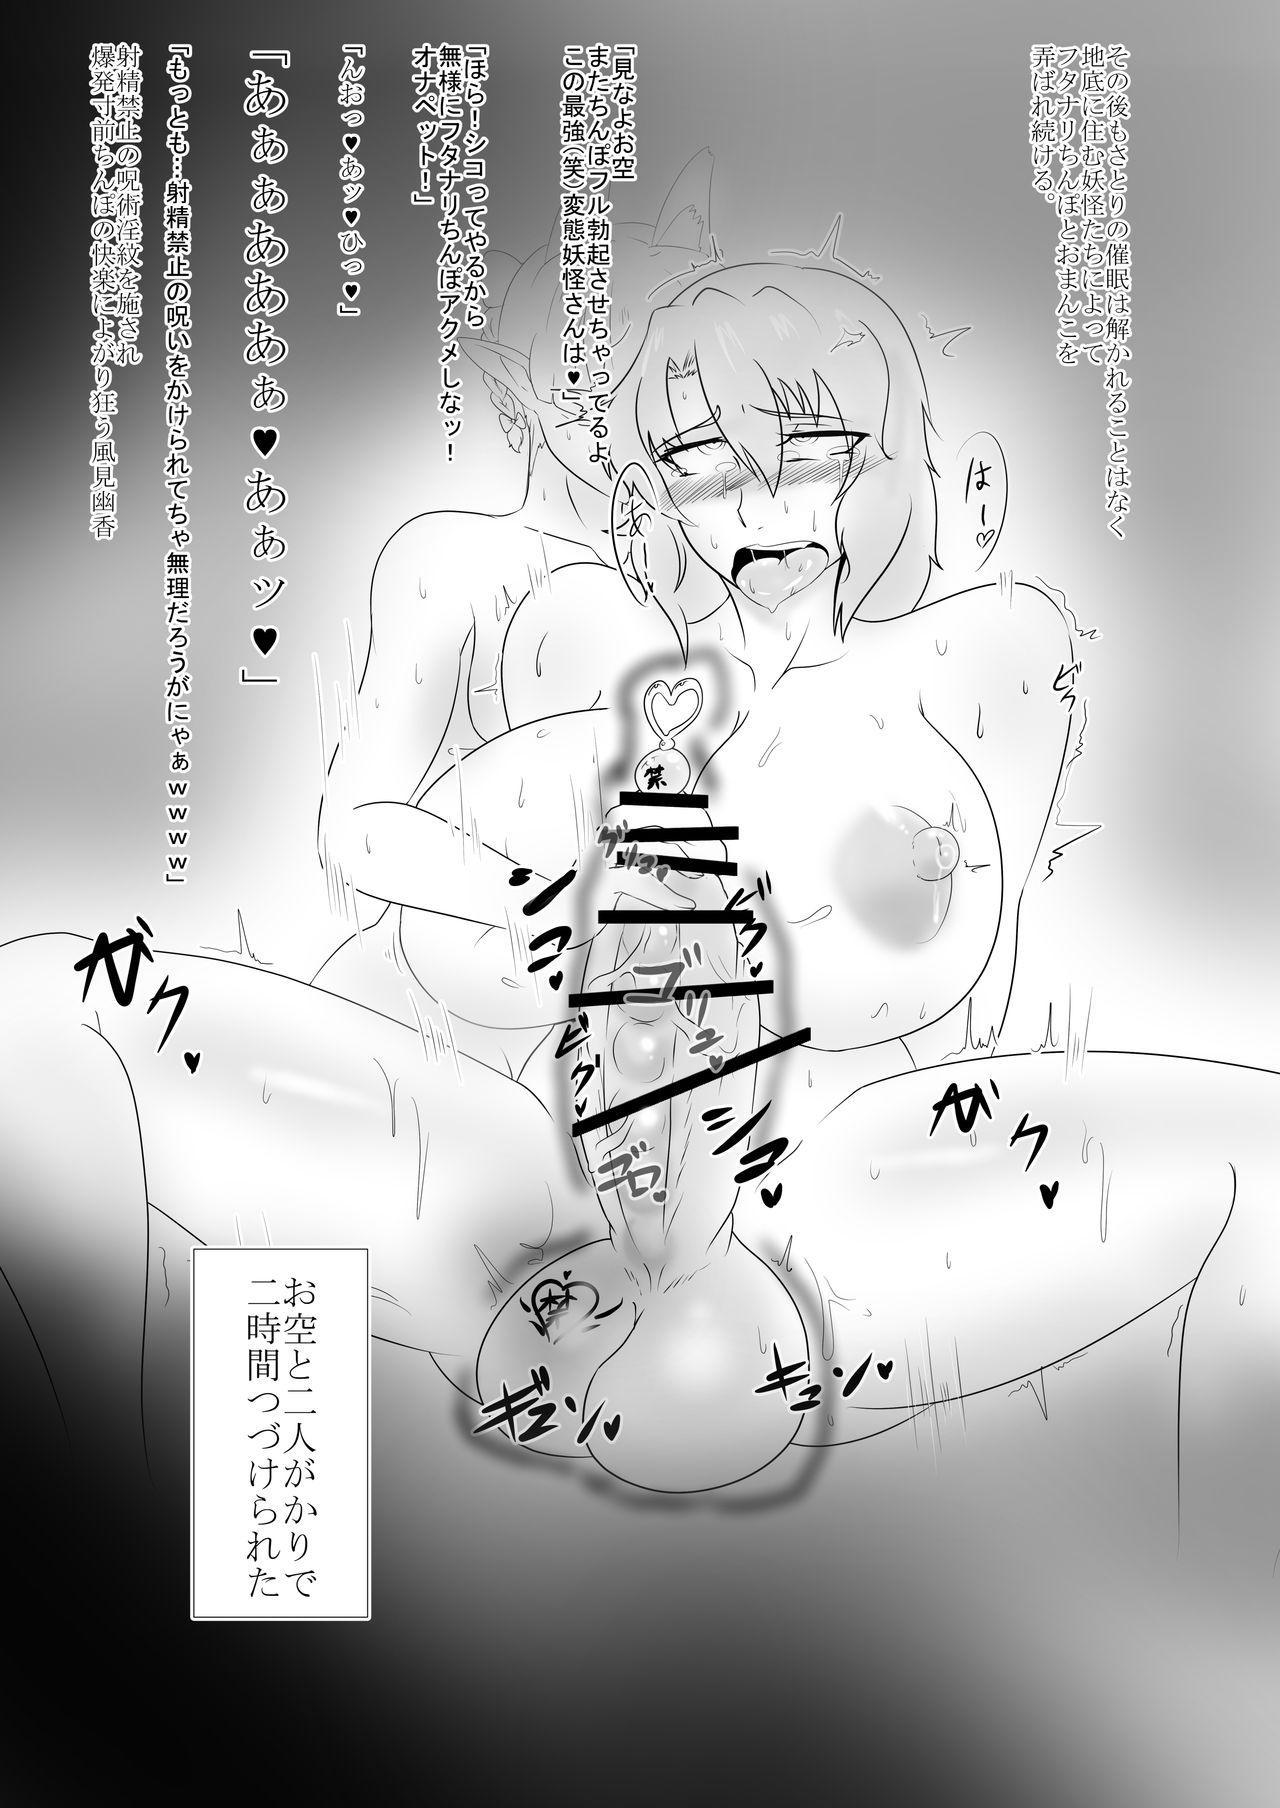 [Black_Sugar(Kari) (Kuroi Megane)] Touhou Futabusa ~Kazami Yuuka~ 2 (Touhou Project) [Digital] 12